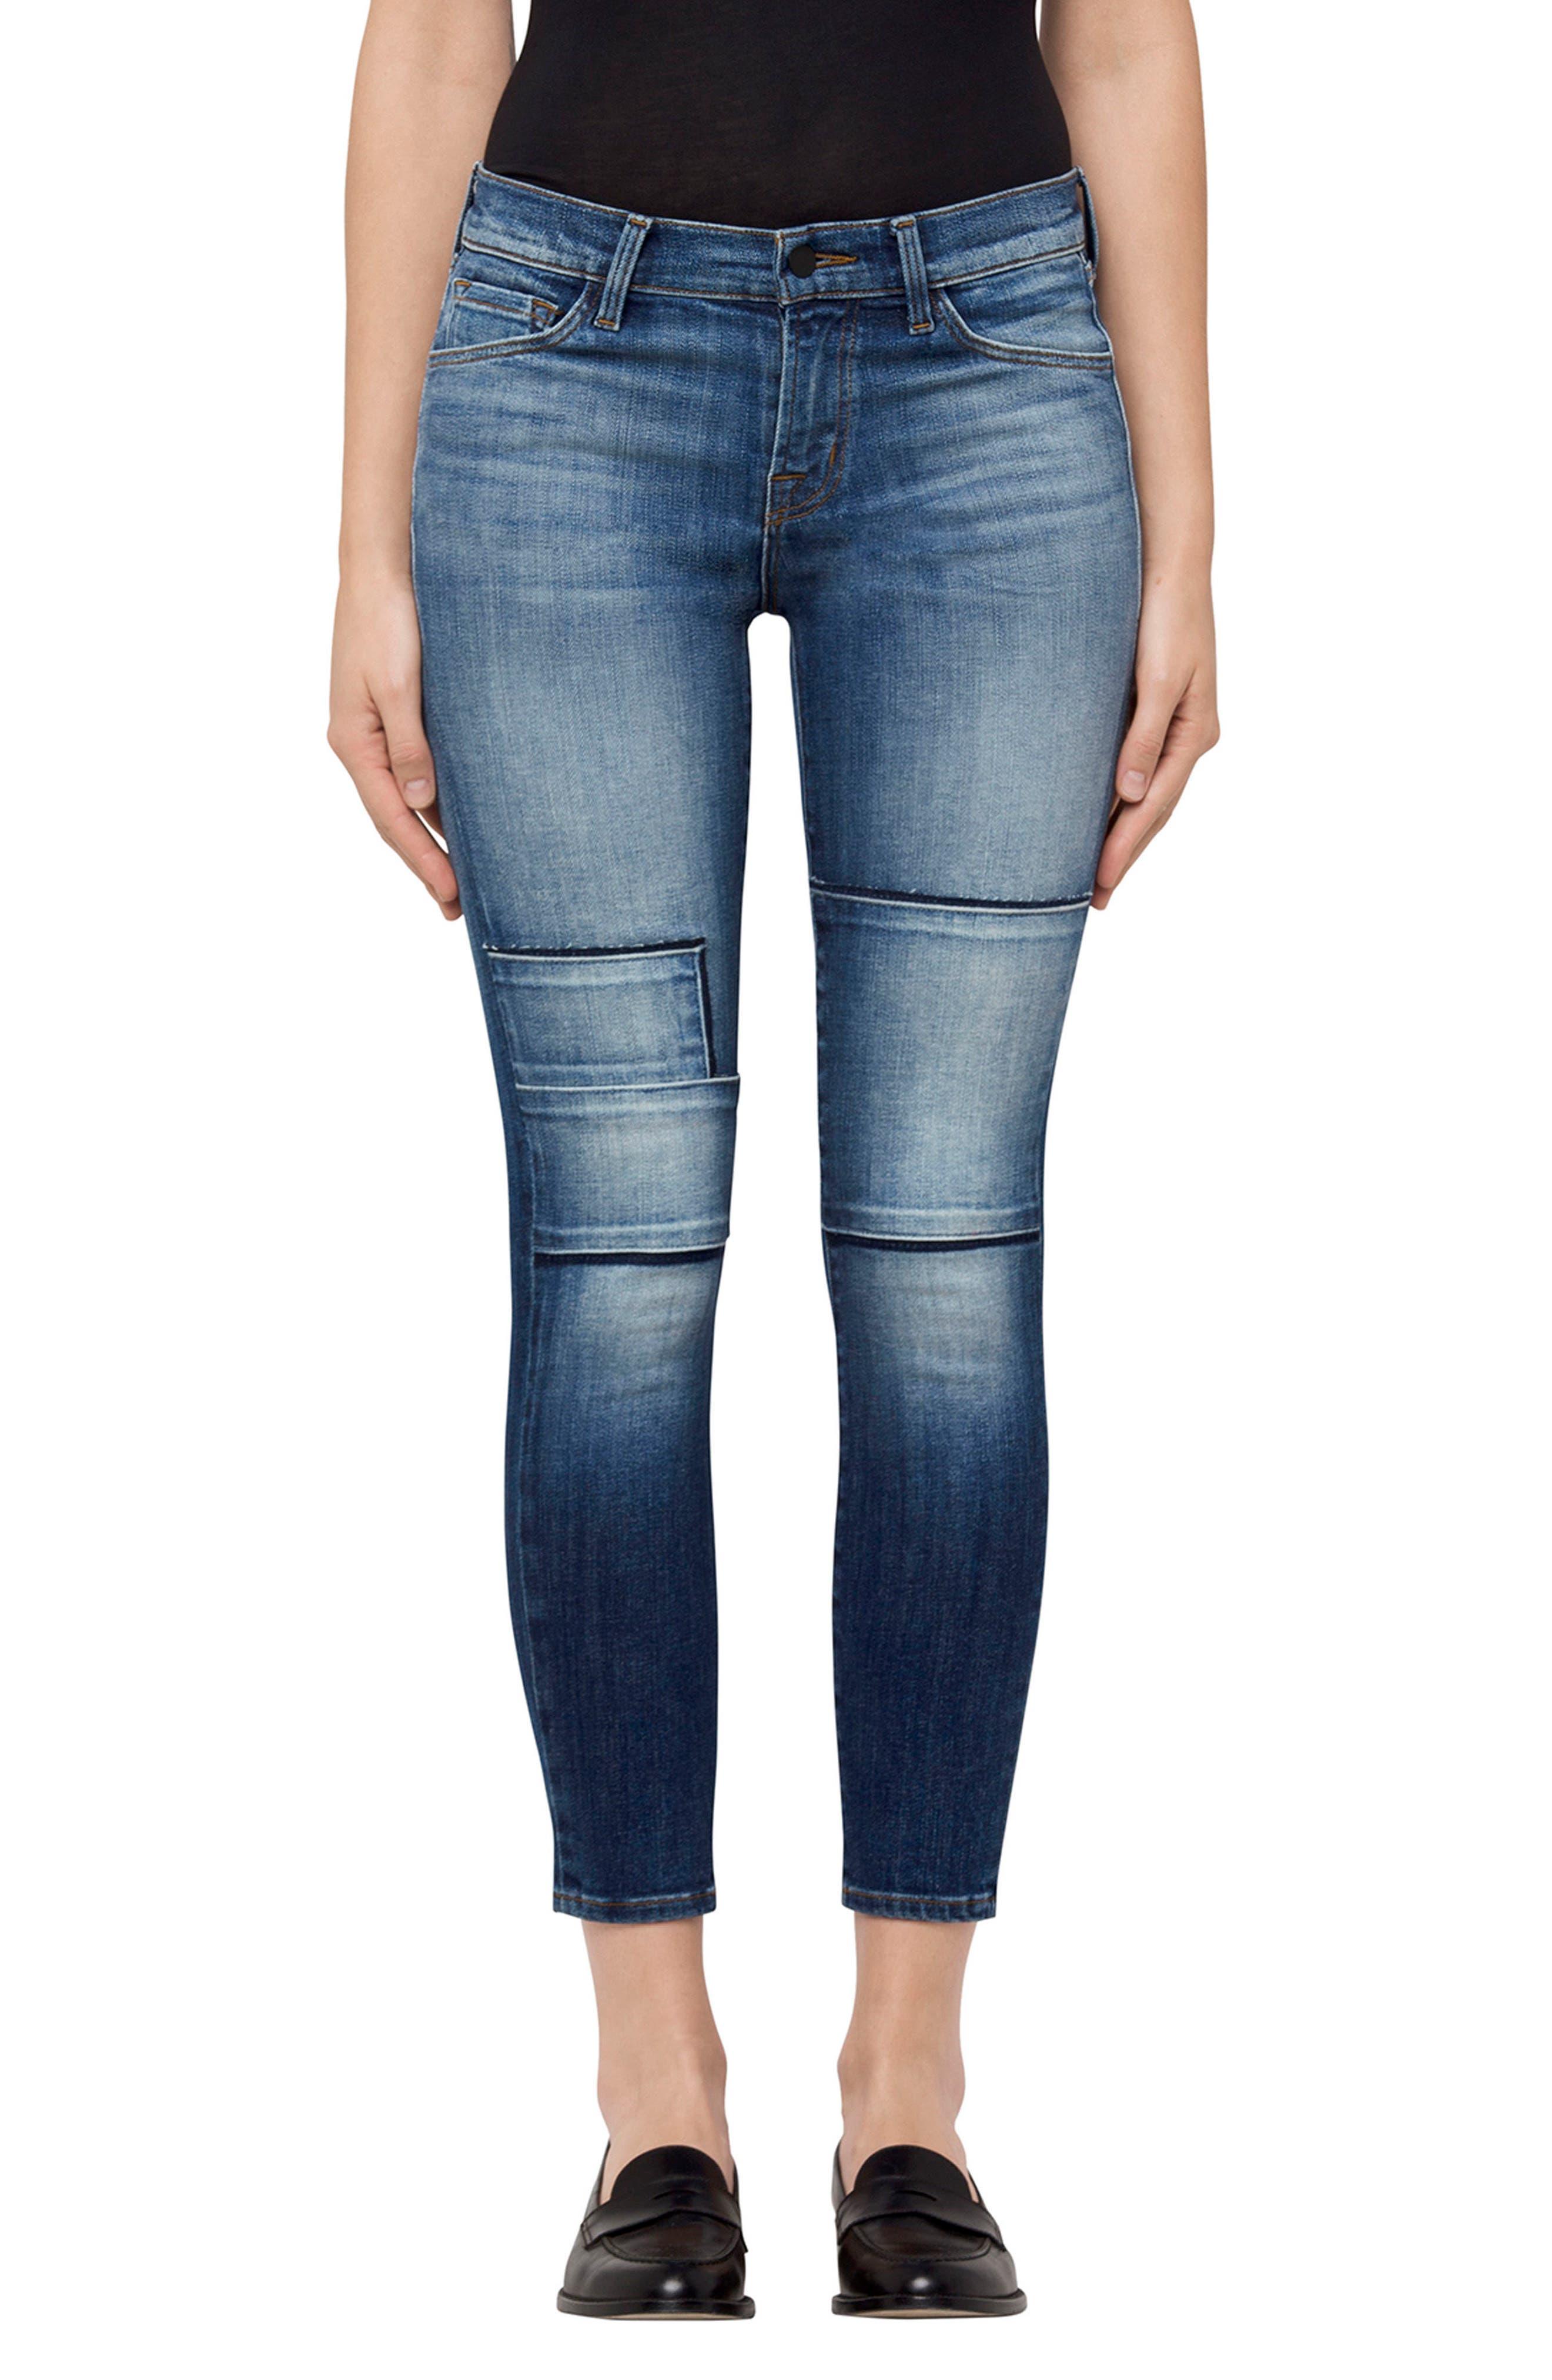 835 Crop Skinny Jeans,                         Main,                         color, Jasper Patched